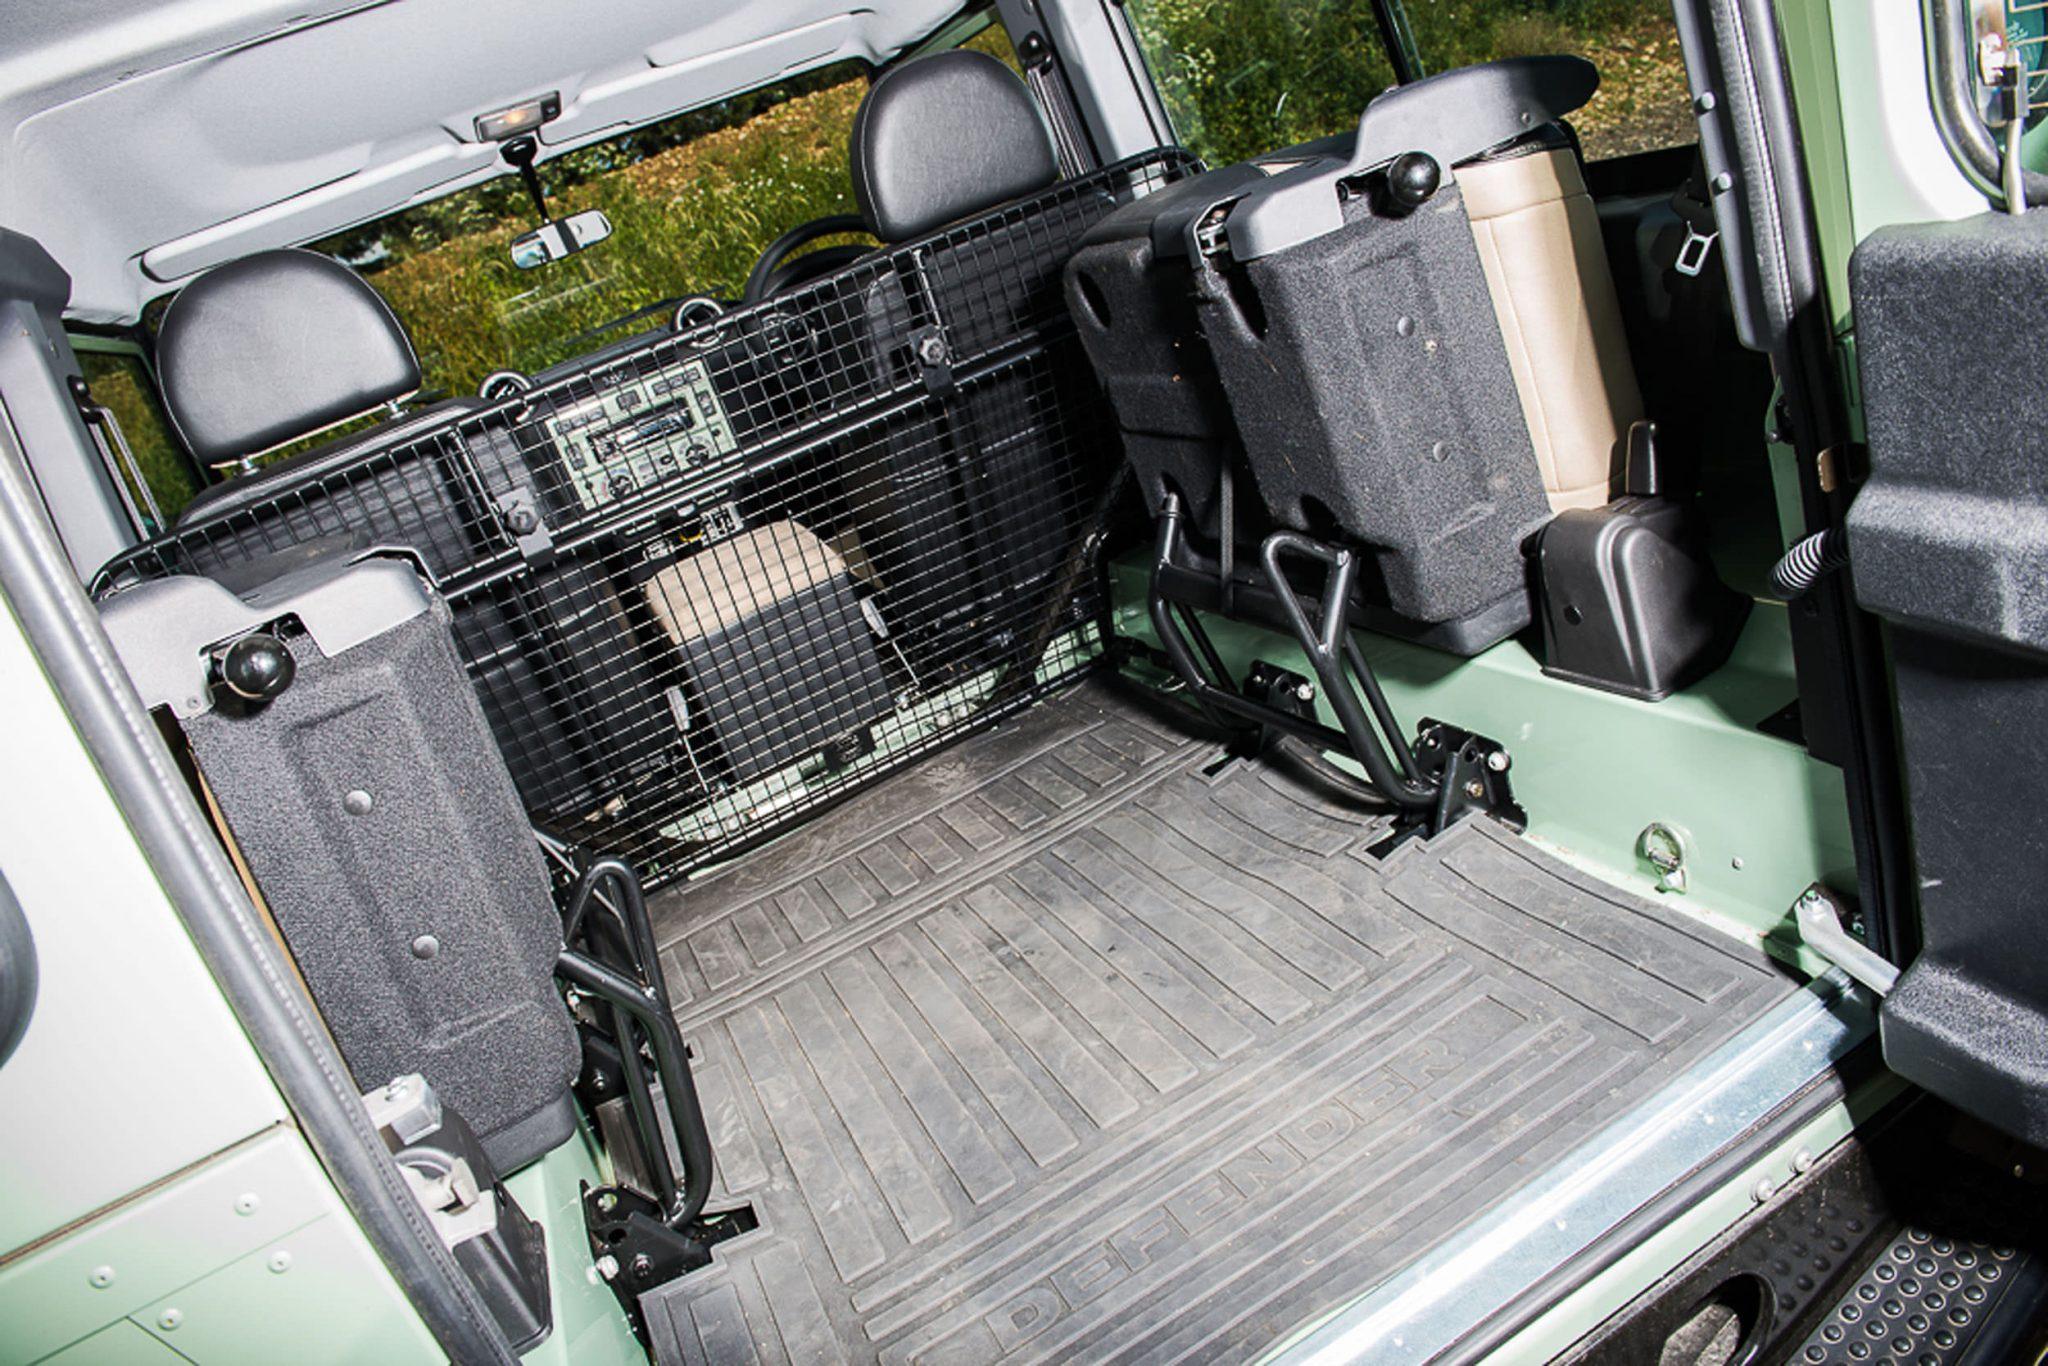 Rowan Atkinson's Land Rover Defender 8 - Rowan Atkinson's Land Rover Defender